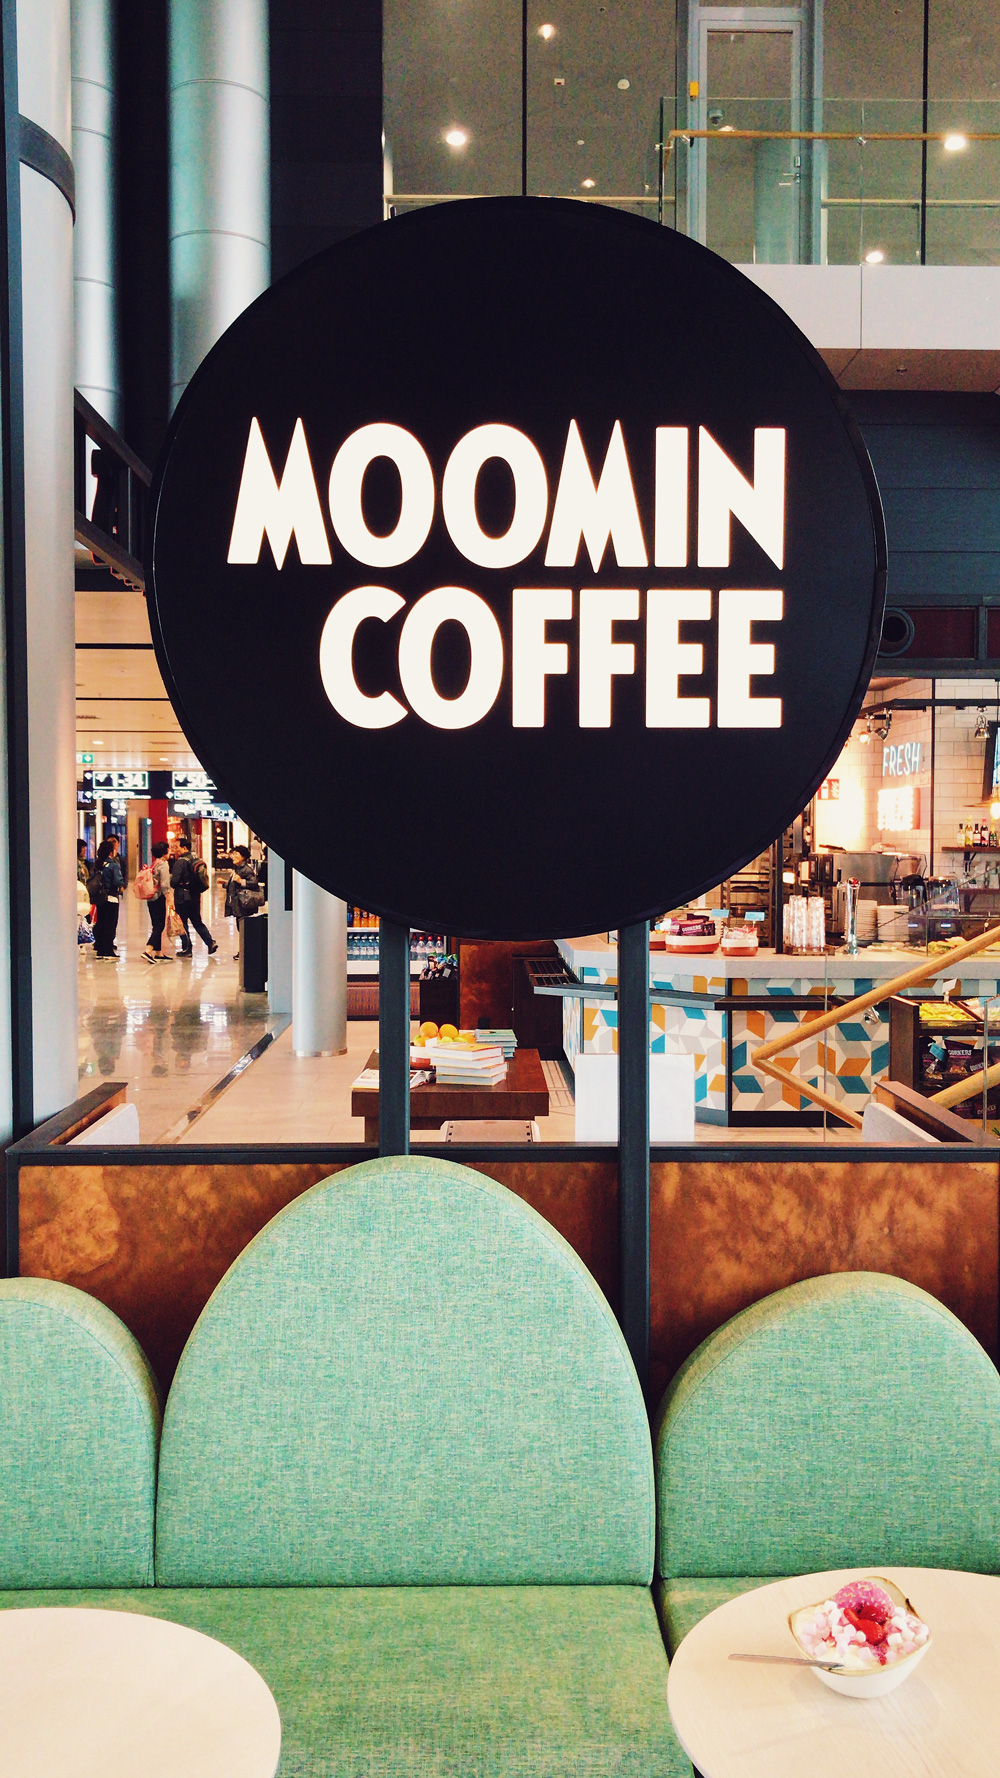 Moomin_Coffee_Helsinki_Airport_Sofa